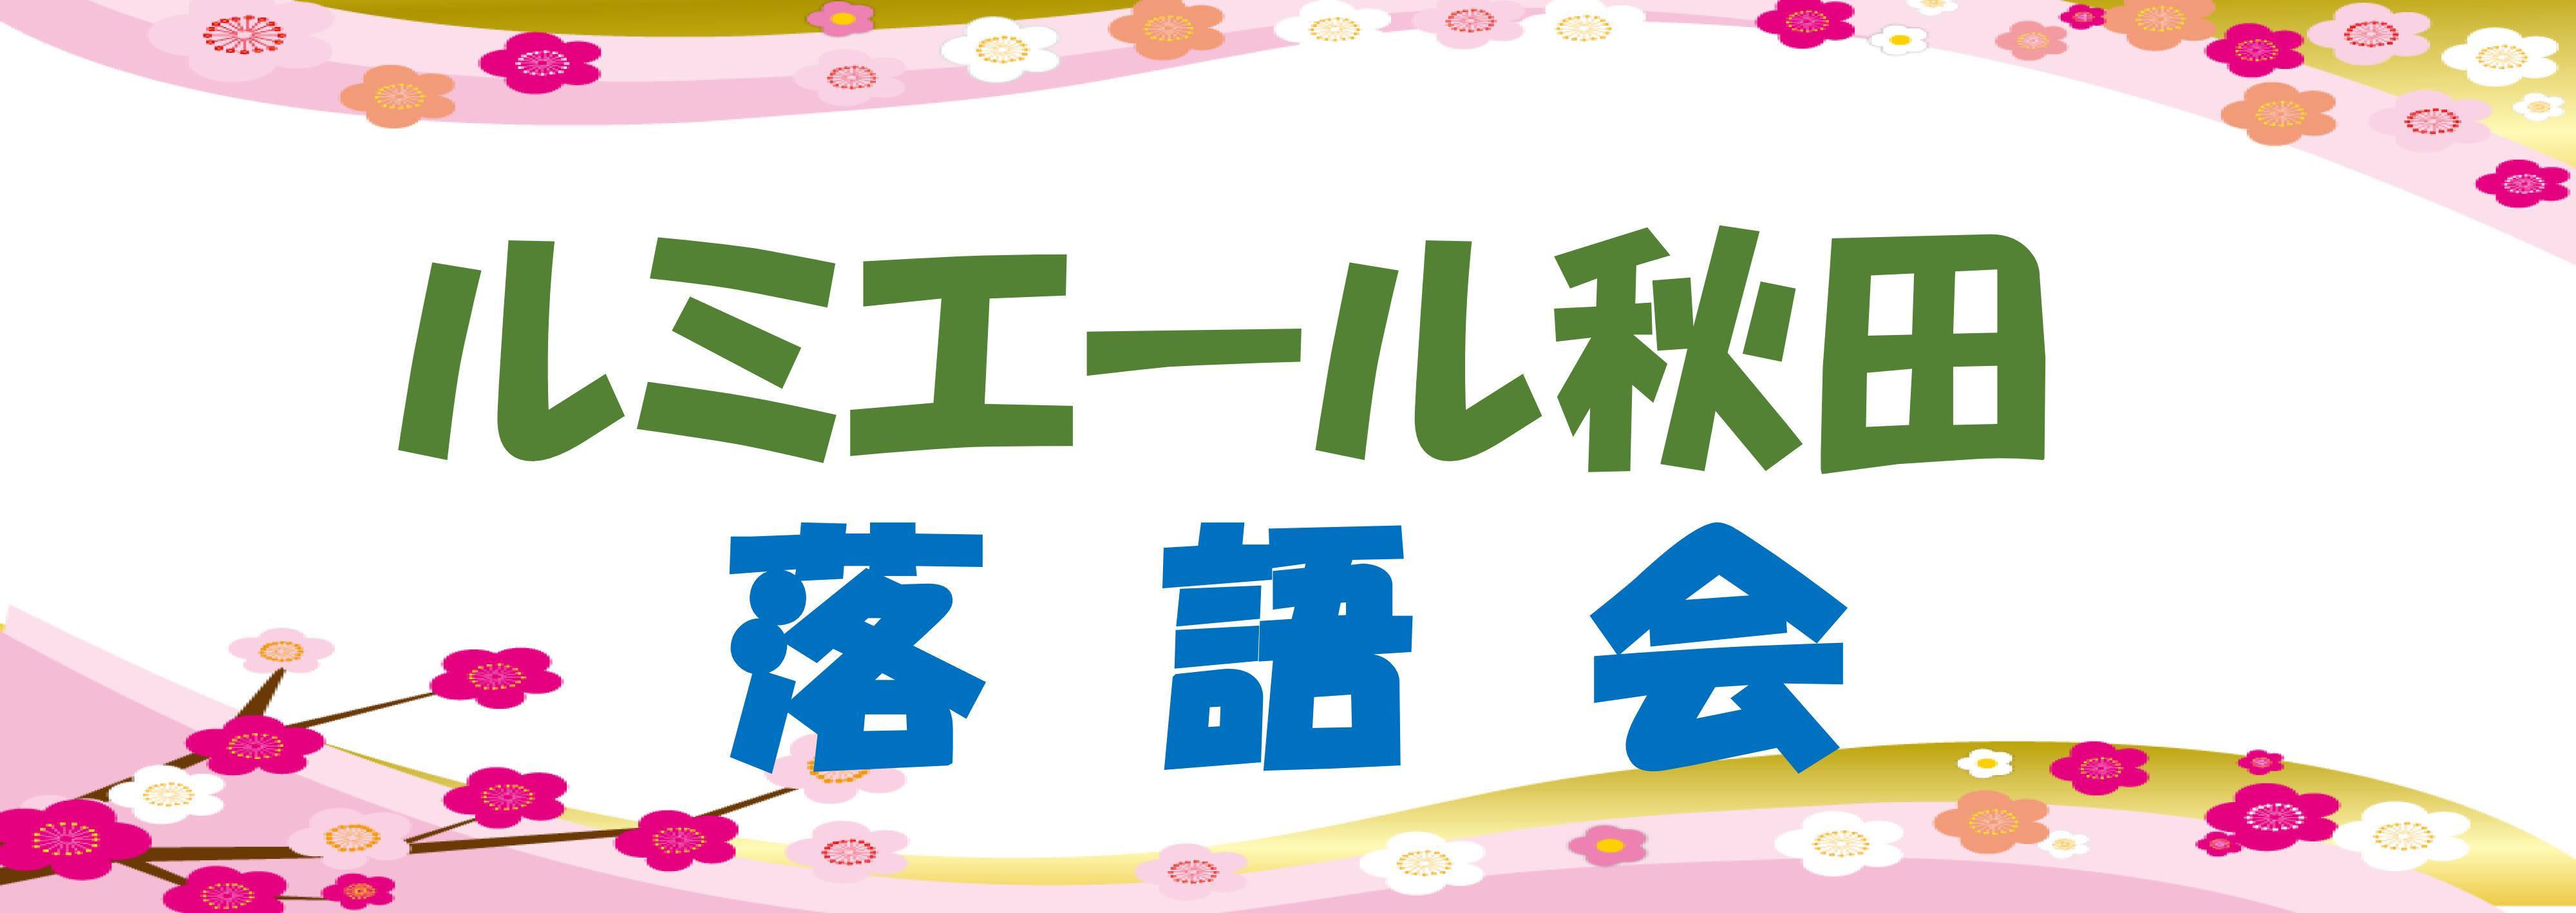 第11回ルミエール秋田落語会 古今亭菊之丞独演会